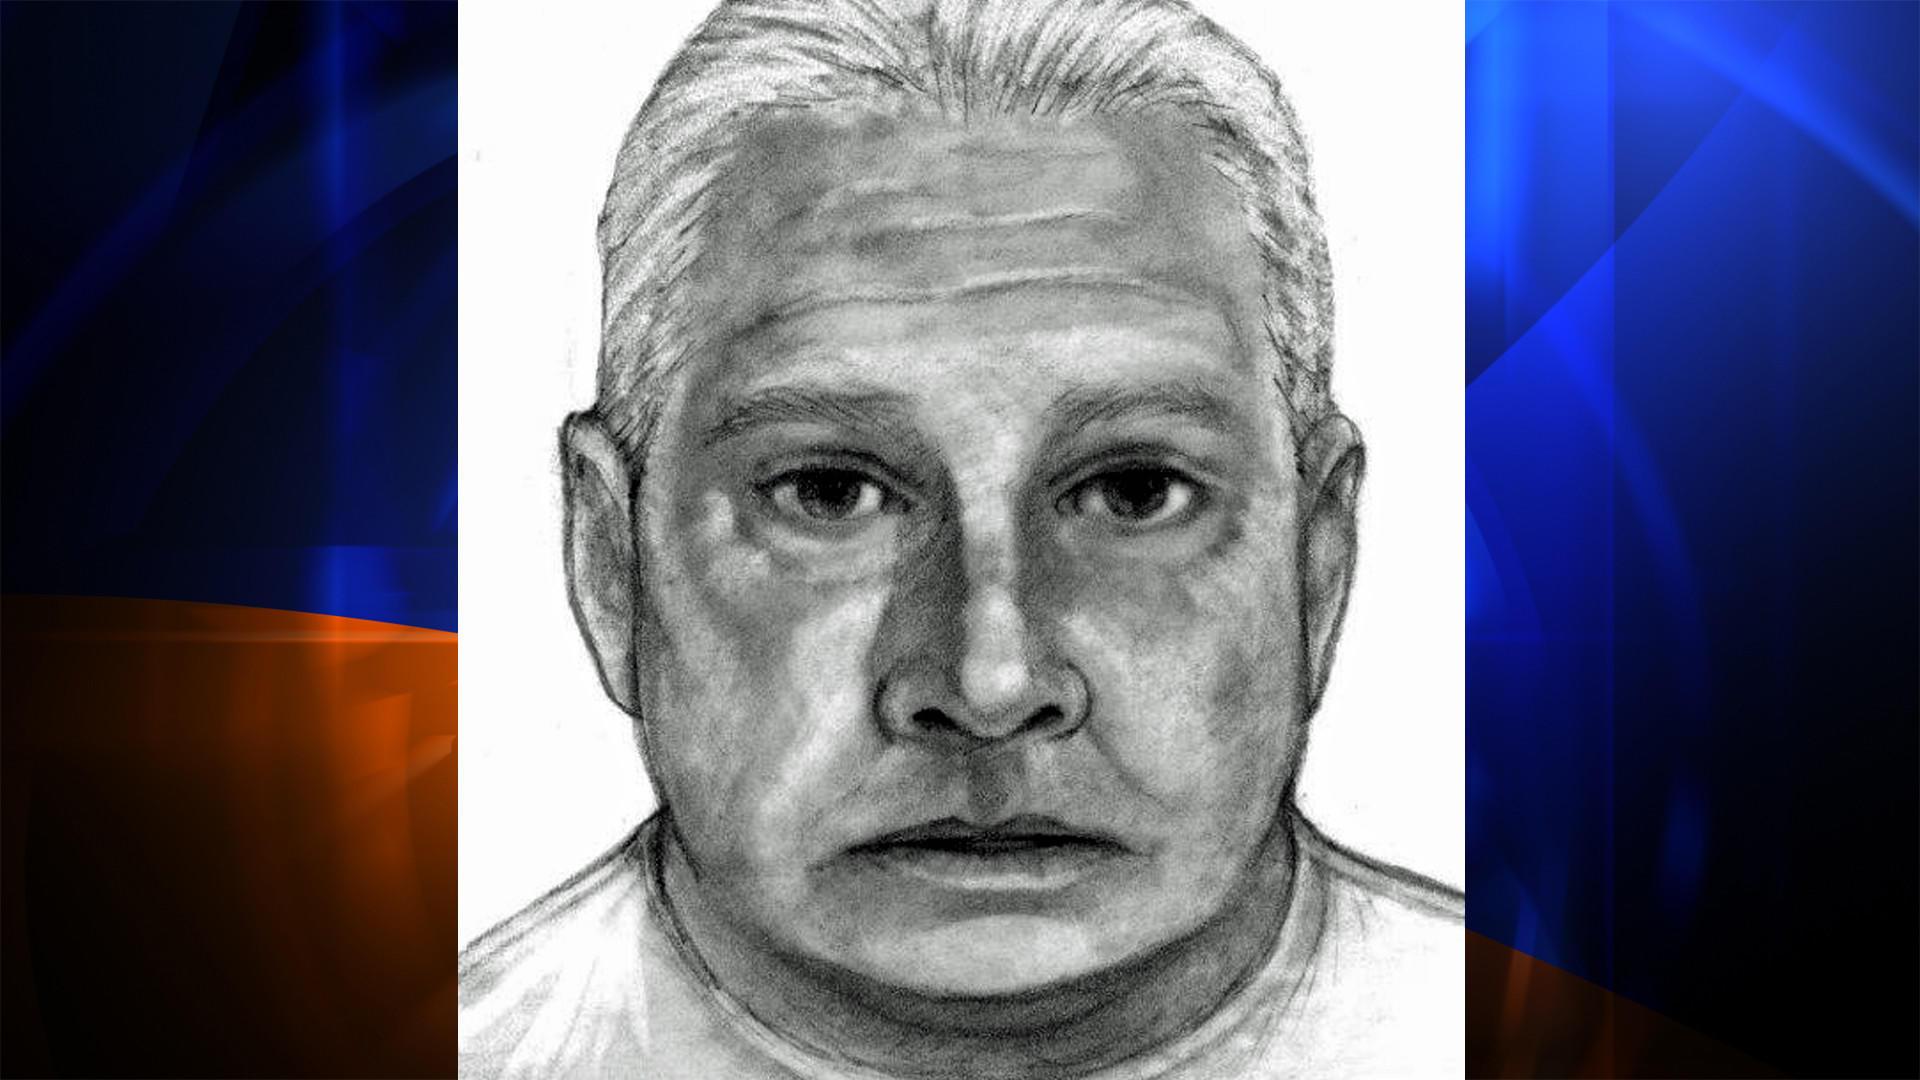 Manhattan Beach police say this man molested a boy in a bathroom at Polliwog Park on Friday.